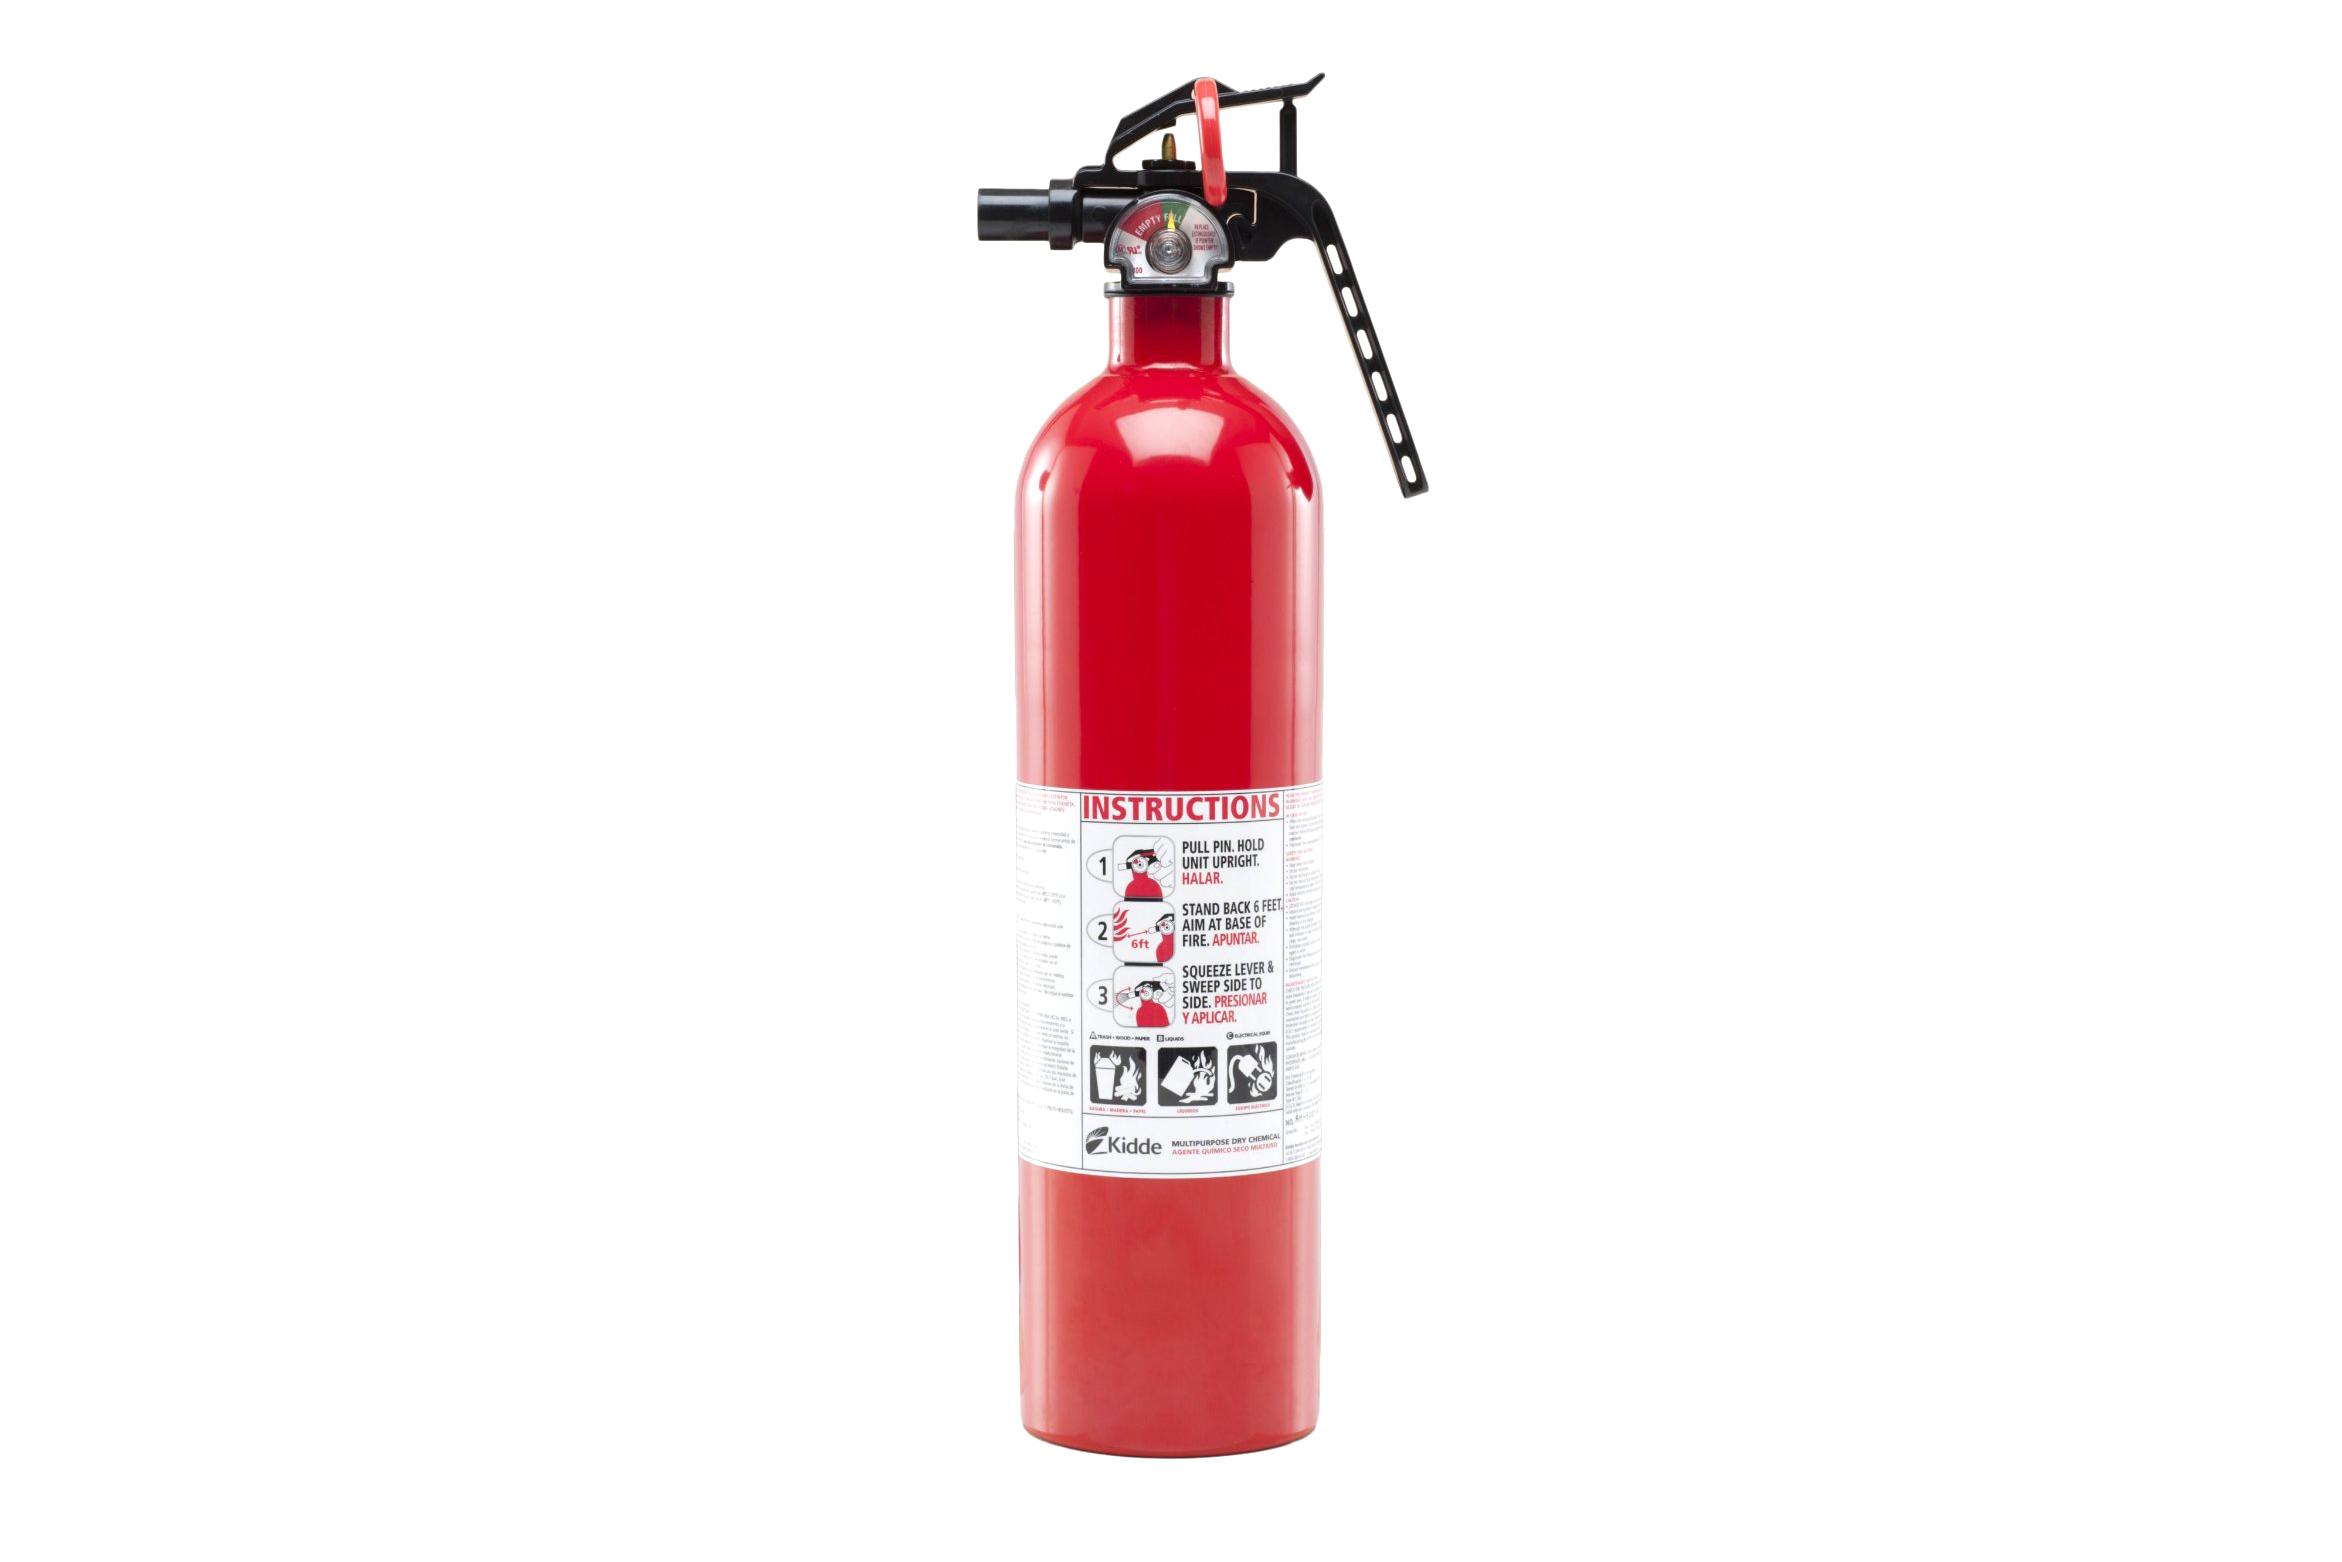 2.5lb Dry Chemical Extinguisher - 4.5 stars - $20 (Prime)